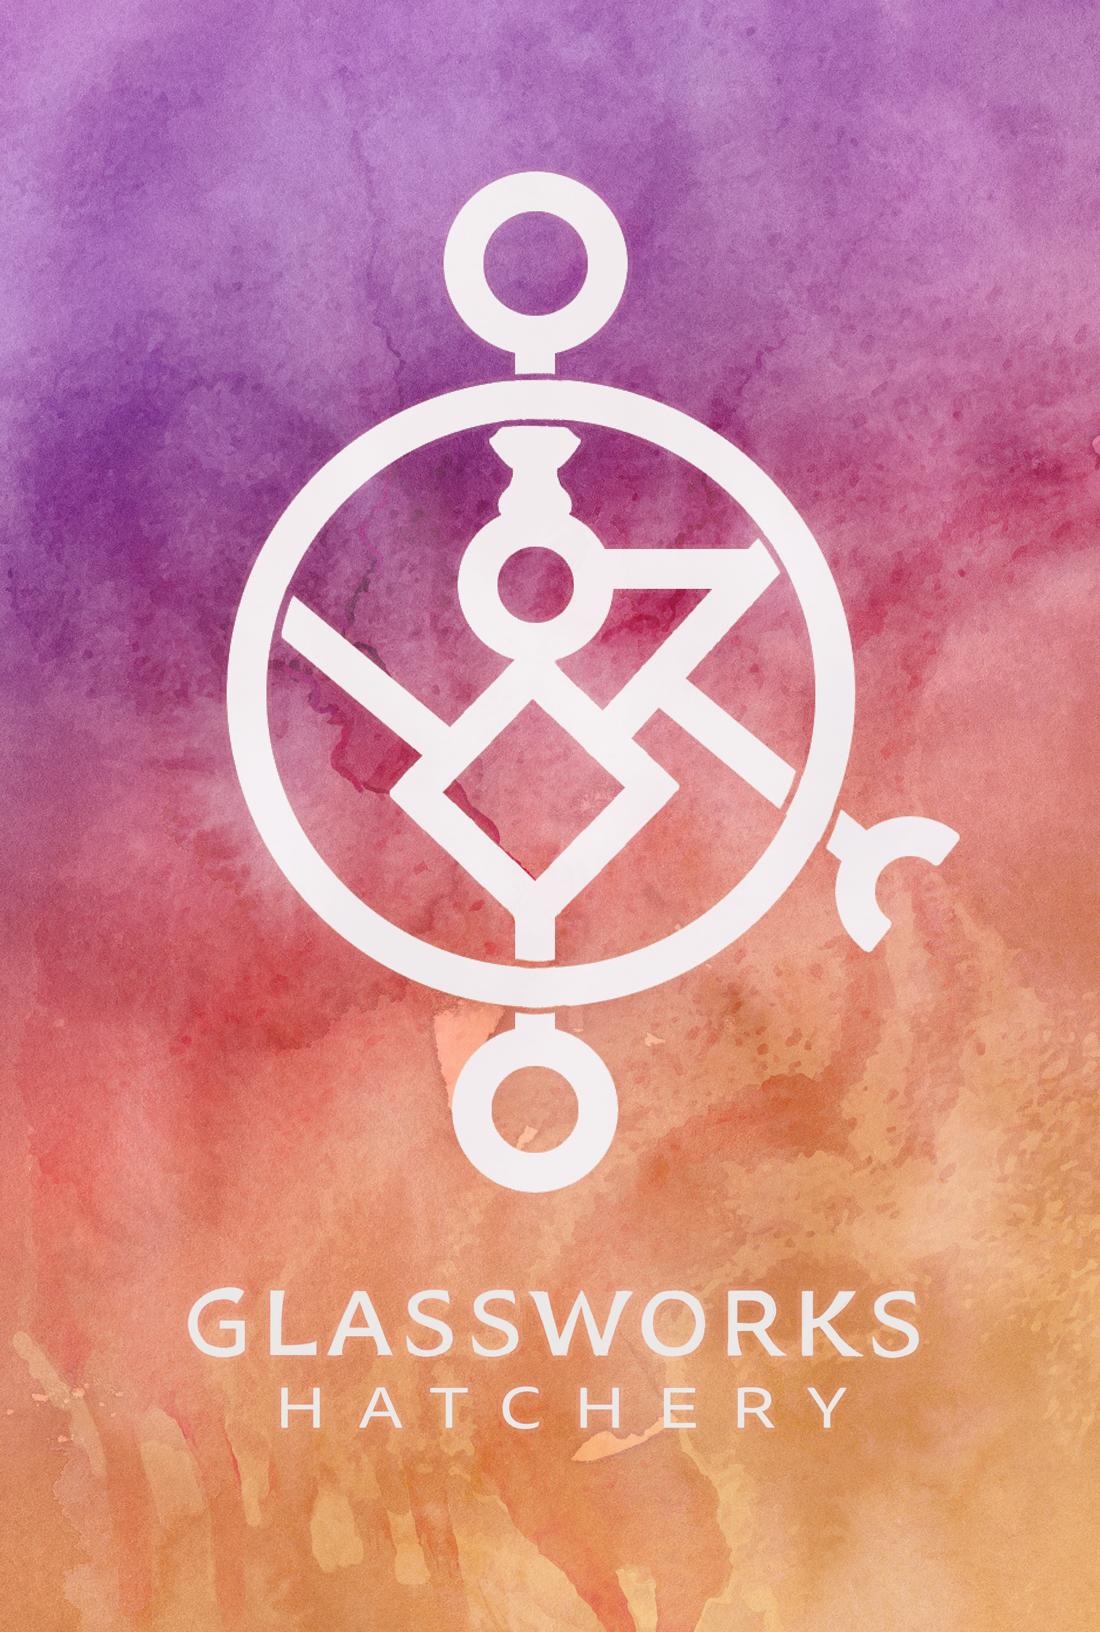 Glassworks Hatchery Poster